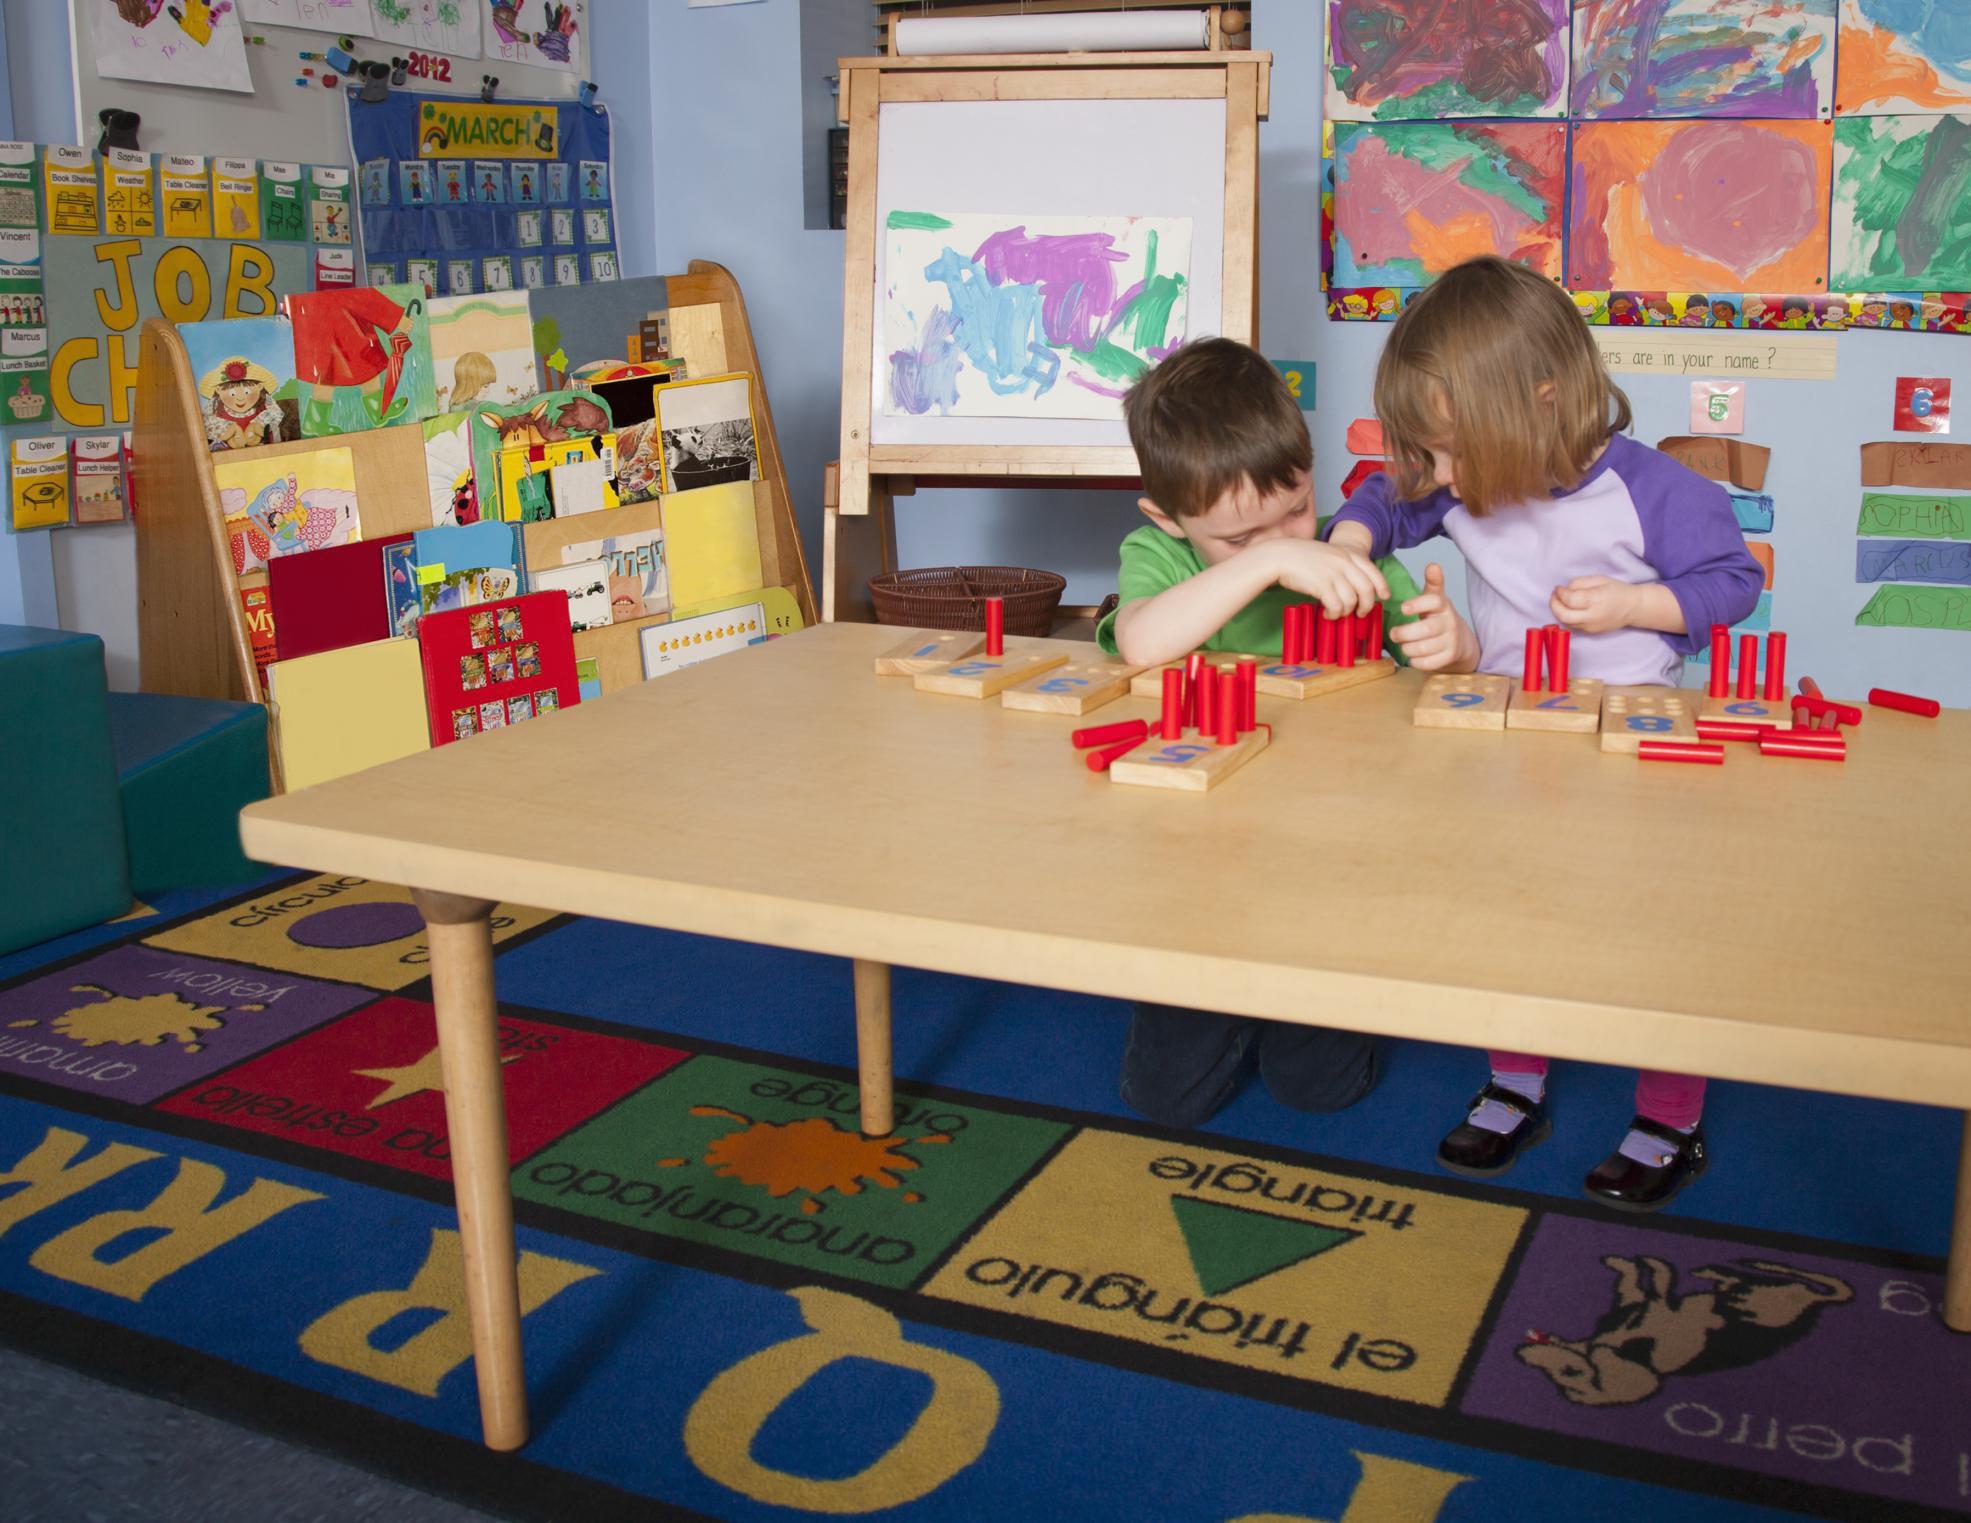 Developmental Or Special Education Preschool